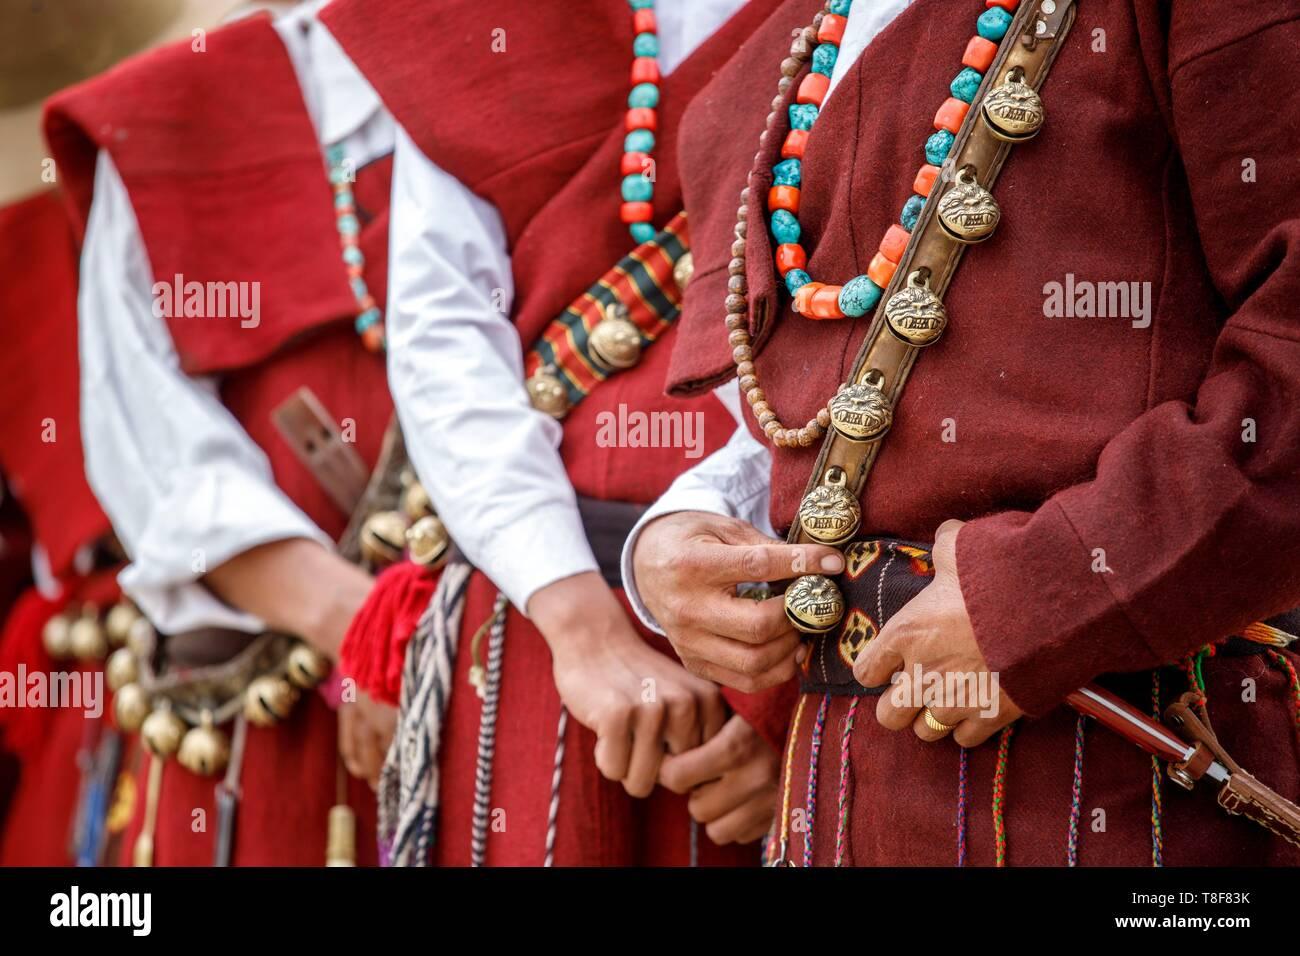 India, state of Jammu and Kashmir, Himalaya, Ladakh, Indus valley, Leh, annual Ladakh Festival, men of a cultural troupe of Gya - Meru region - Stock Image